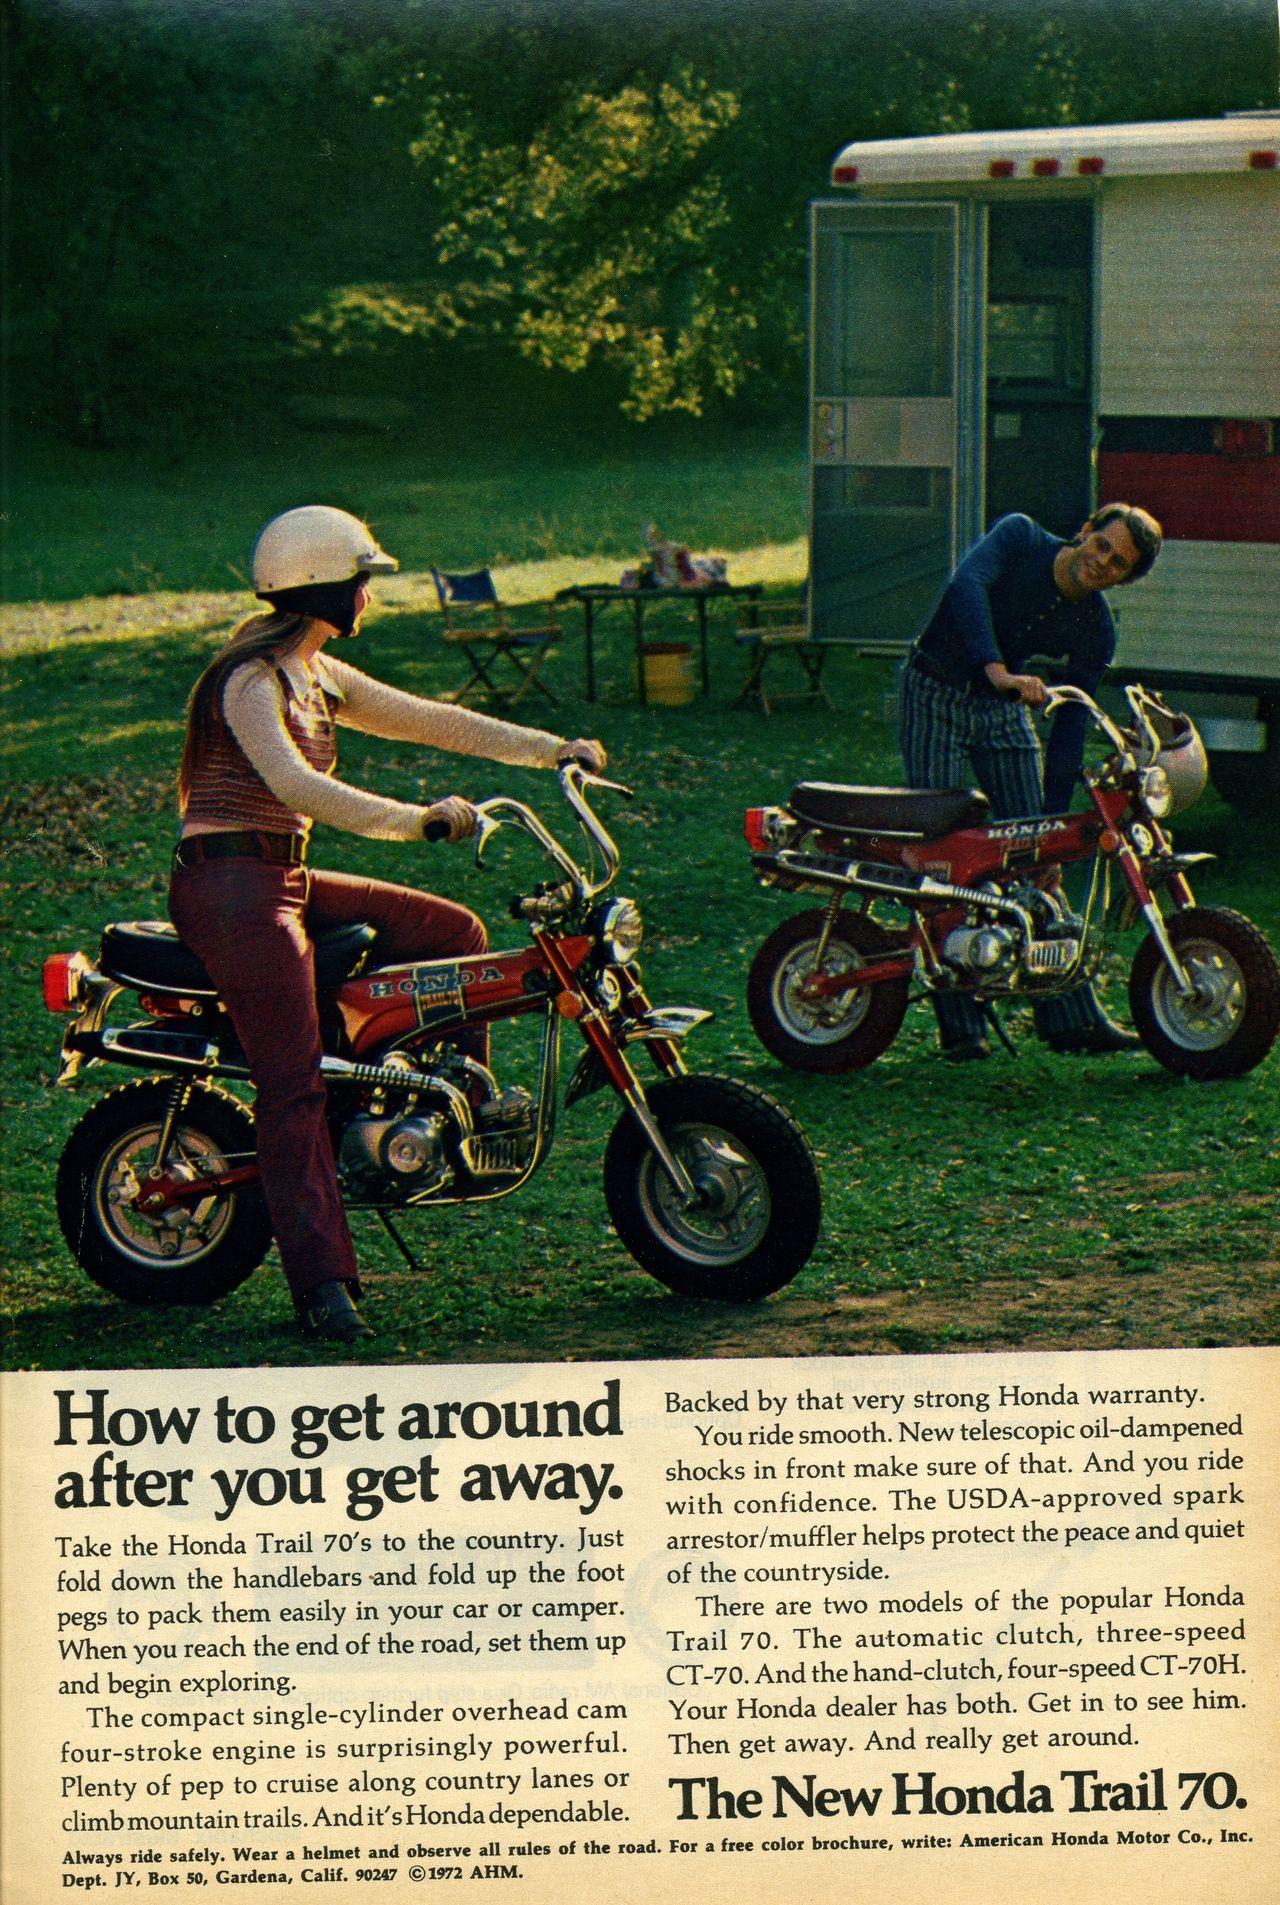 medium resolution of 1972 honda trail 70 advertisement photo picture